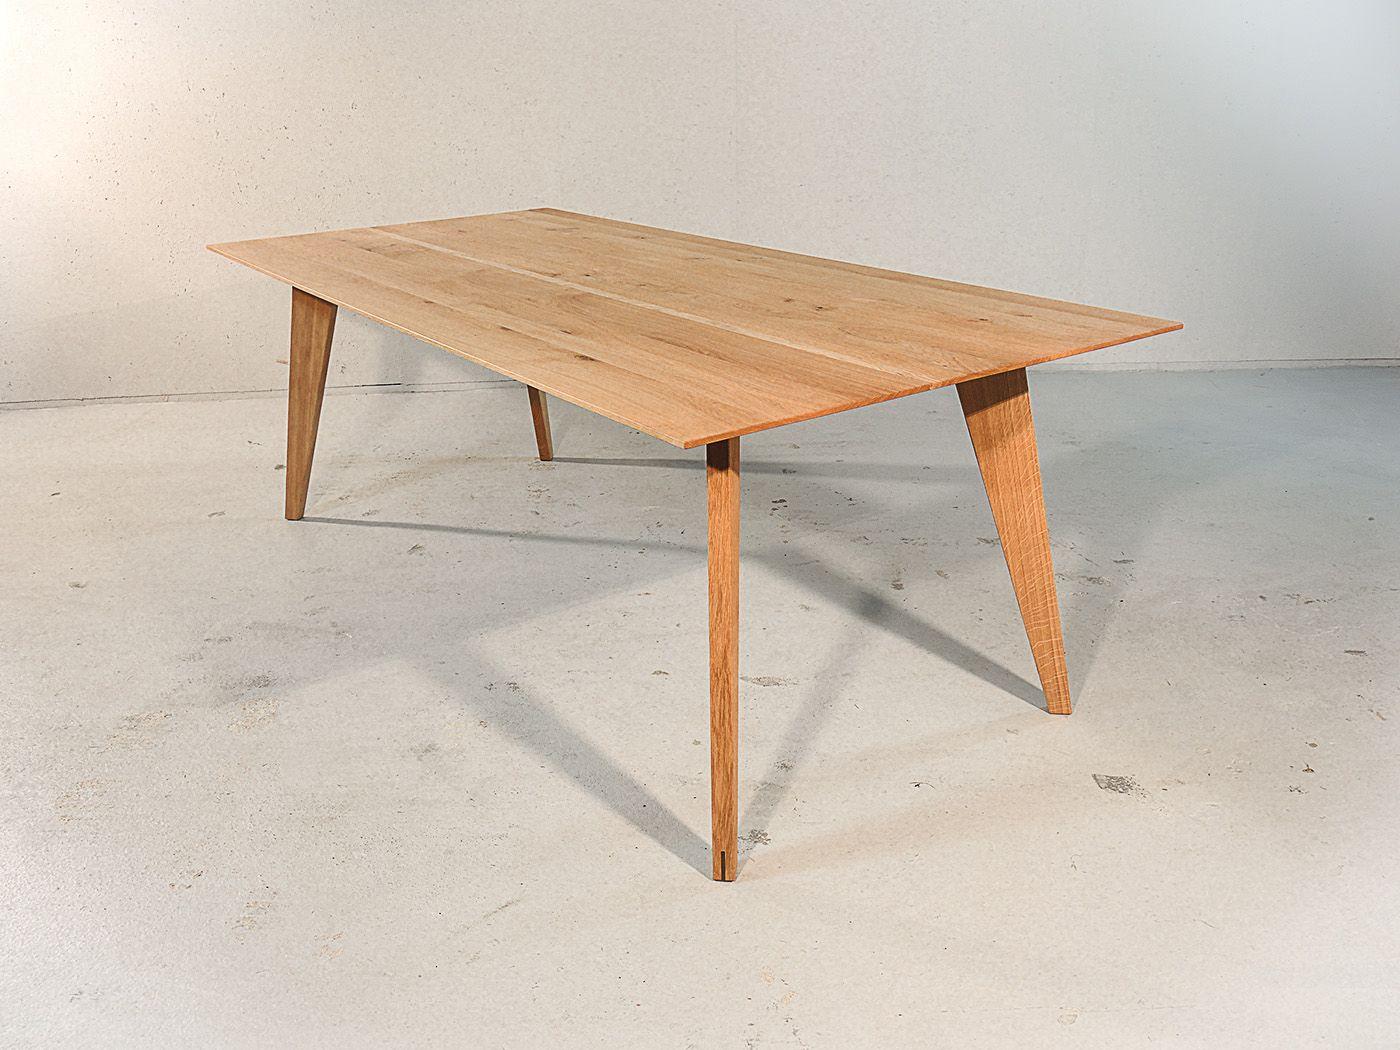 Notenhouten Design Eettafel.Modena Design Eiken Eettafel Tafel Modern Table Dining